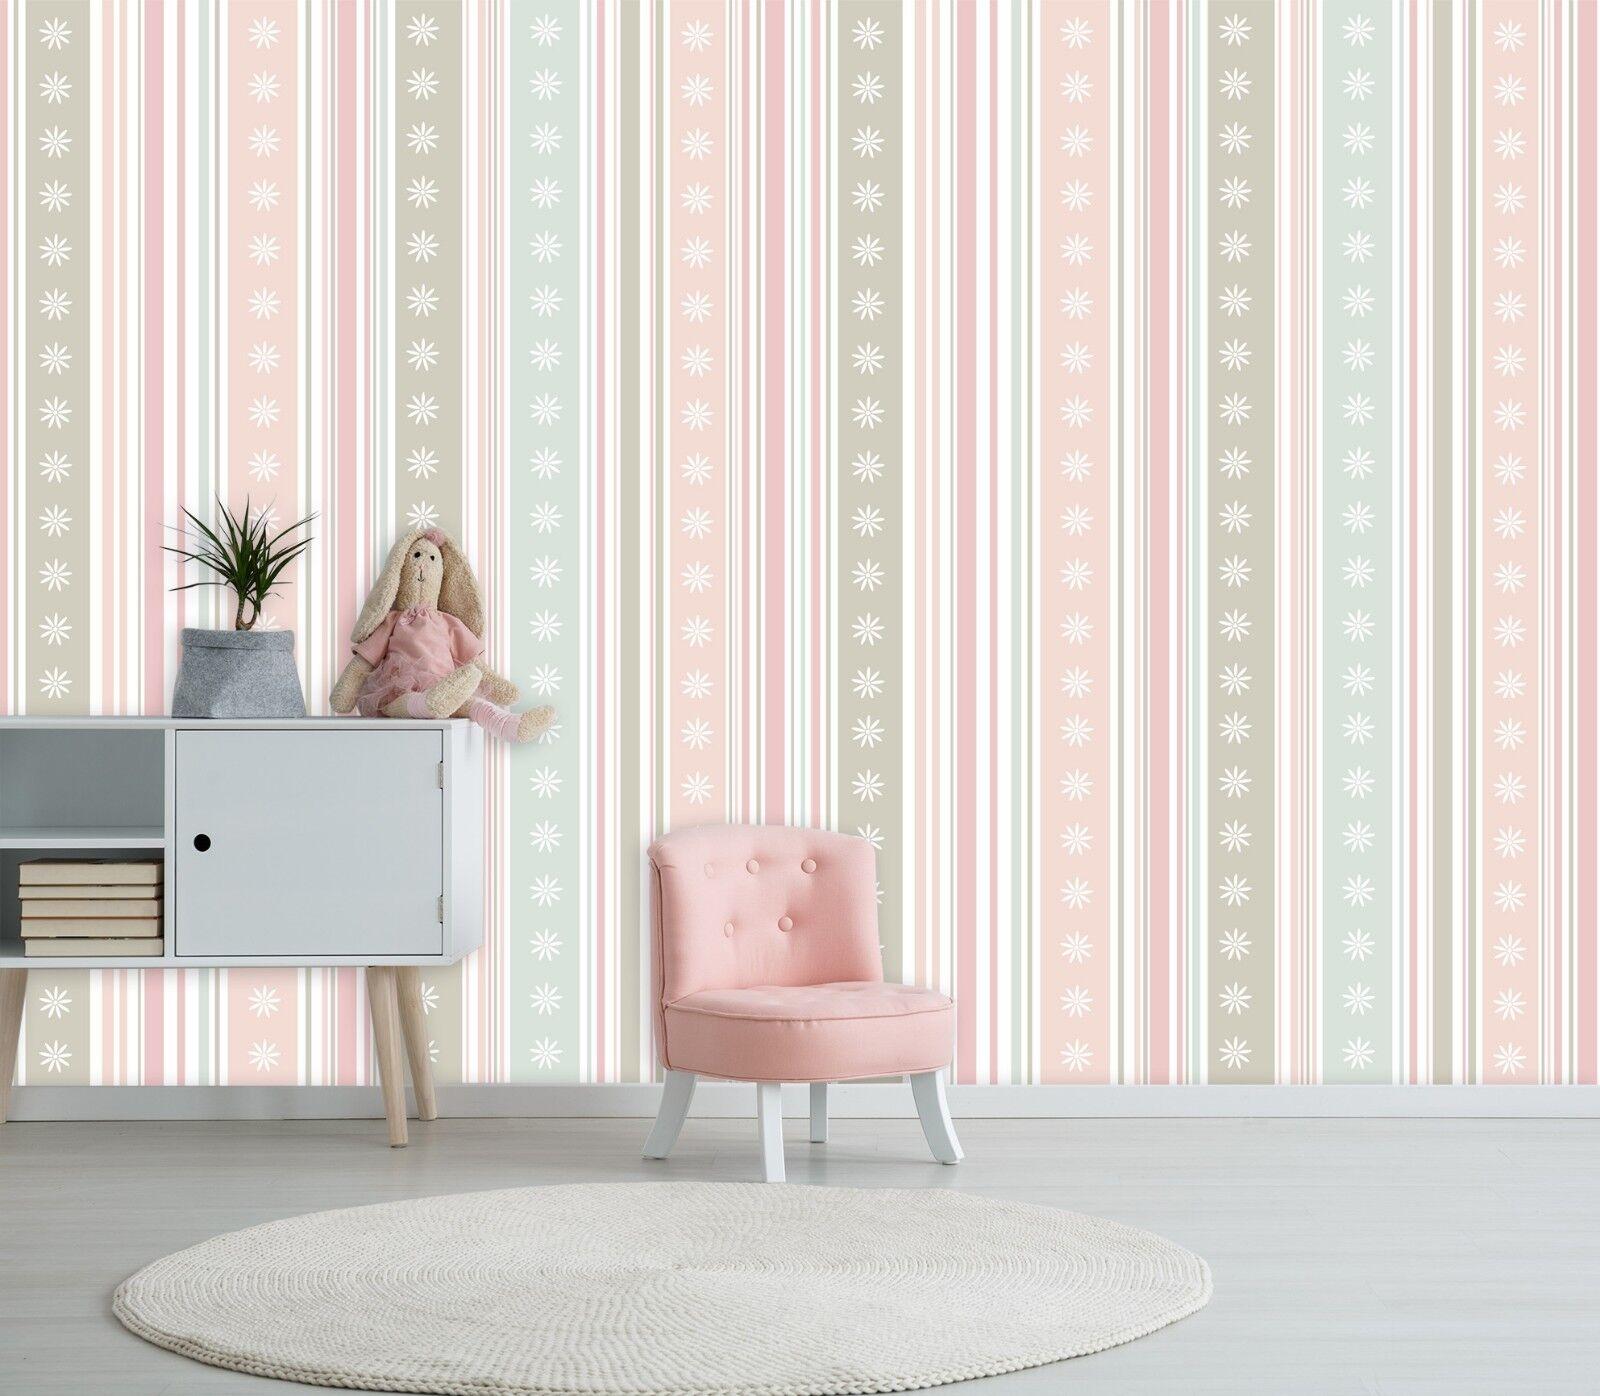 3D Snowflakes Stripe 455 Wallpaper Murals Wall Print Wallpaper Mural AJ WALL AU